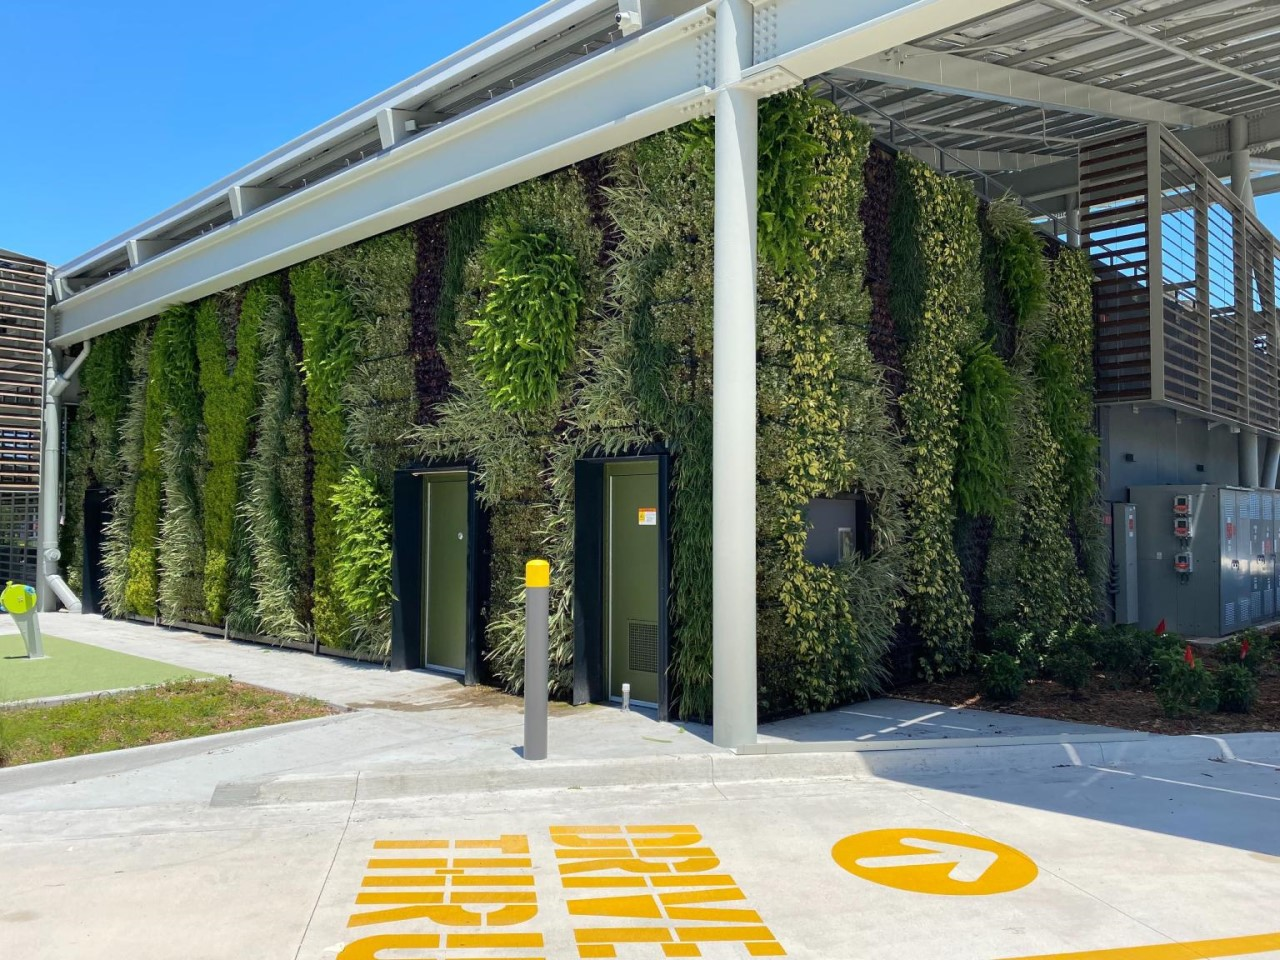 Verticale tuin aan gevel McDonald's Orlando Florida